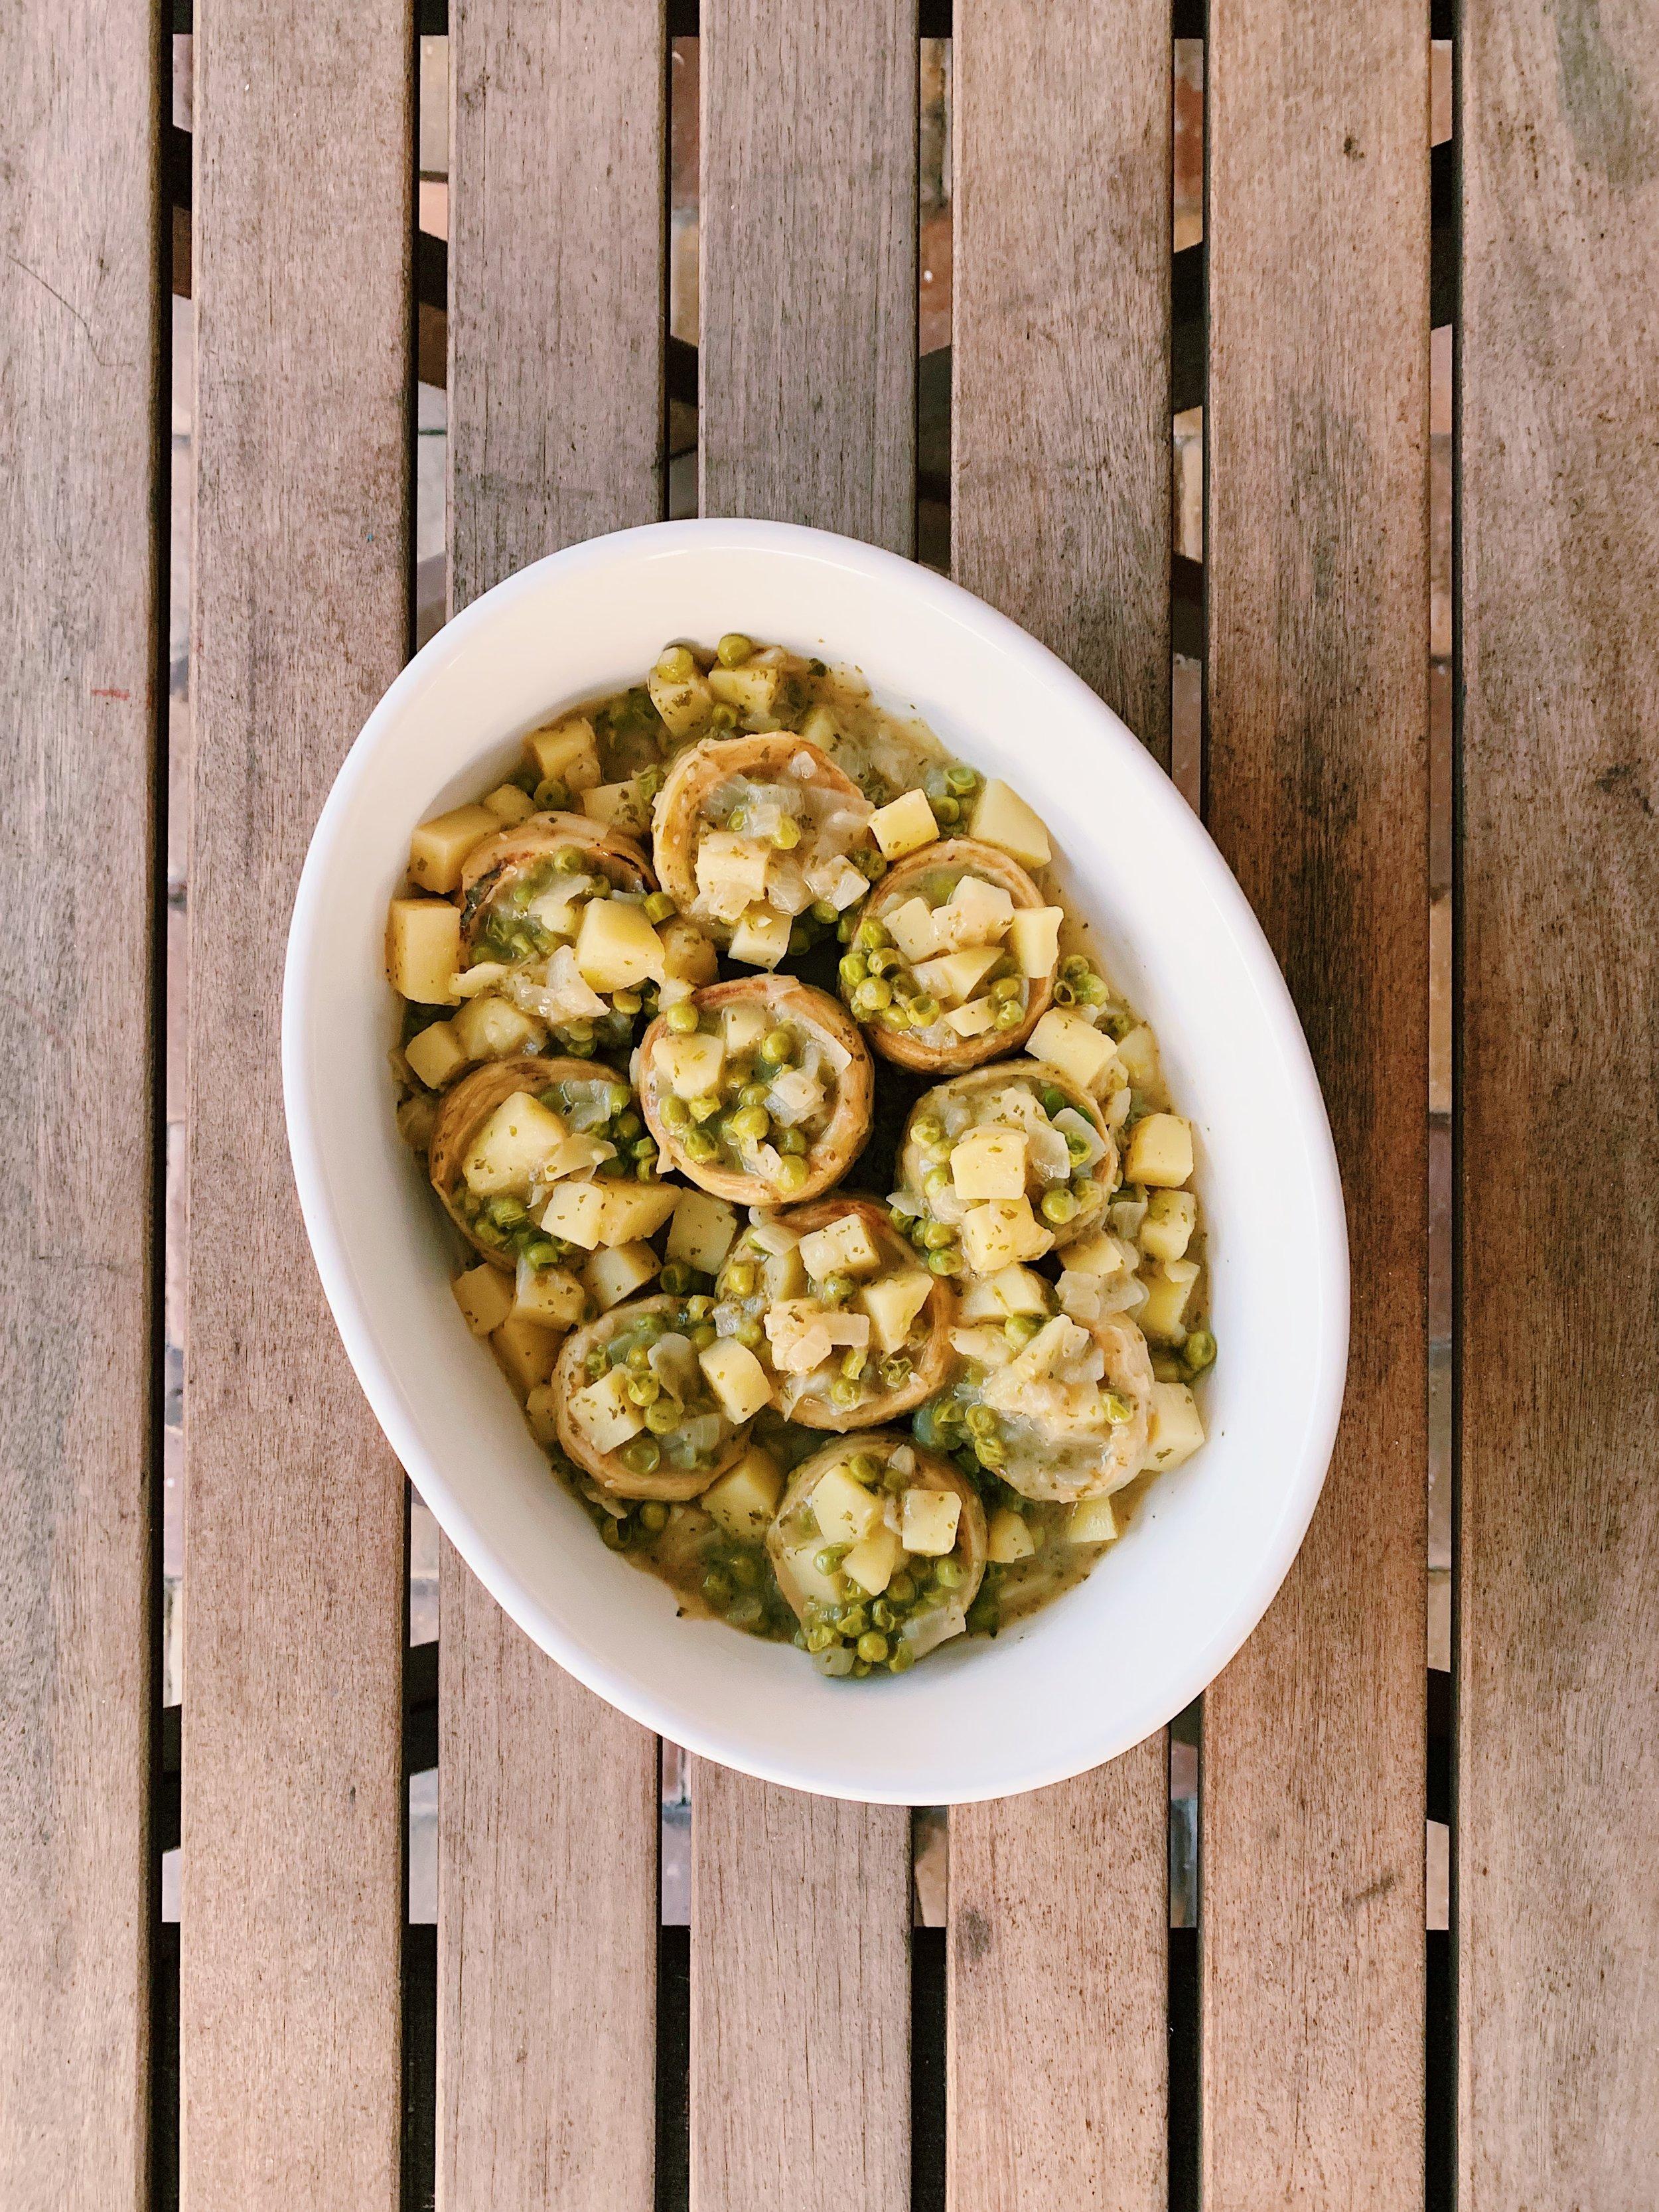 Cold Artichoke Salad | RafaellaSargi.com